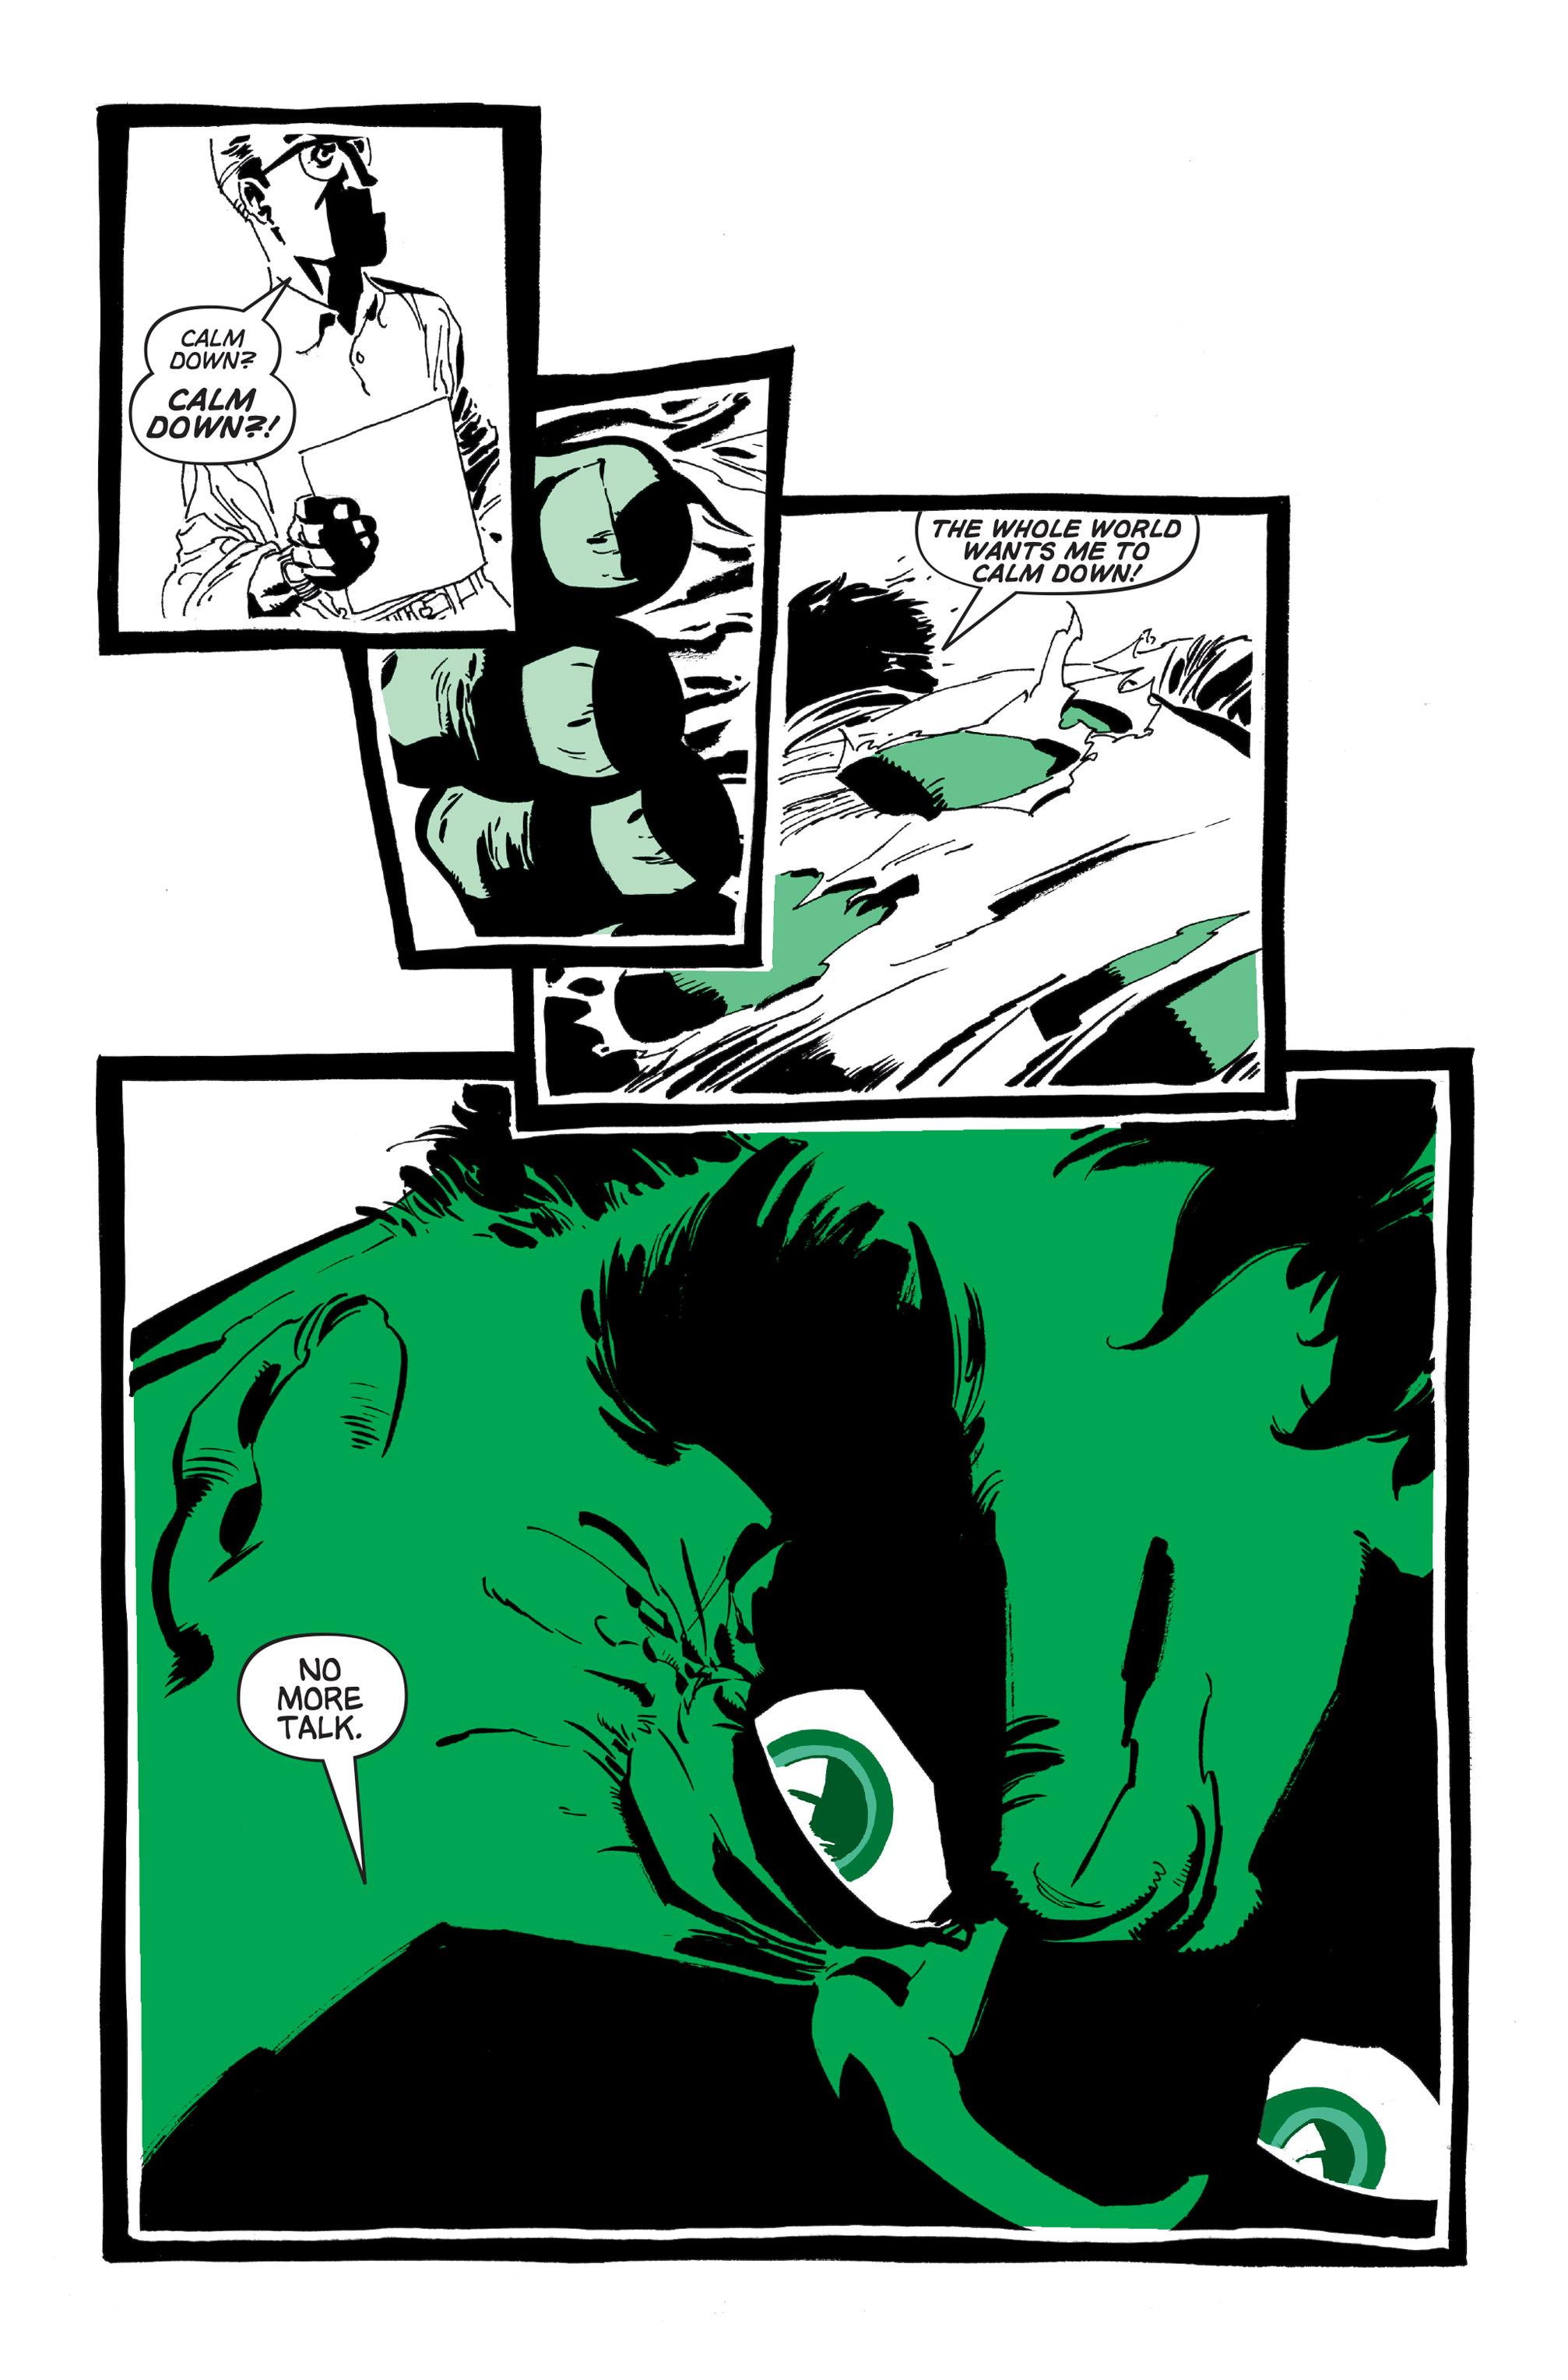 Read online Hulk: Gray comic -  Issue #6 - 21